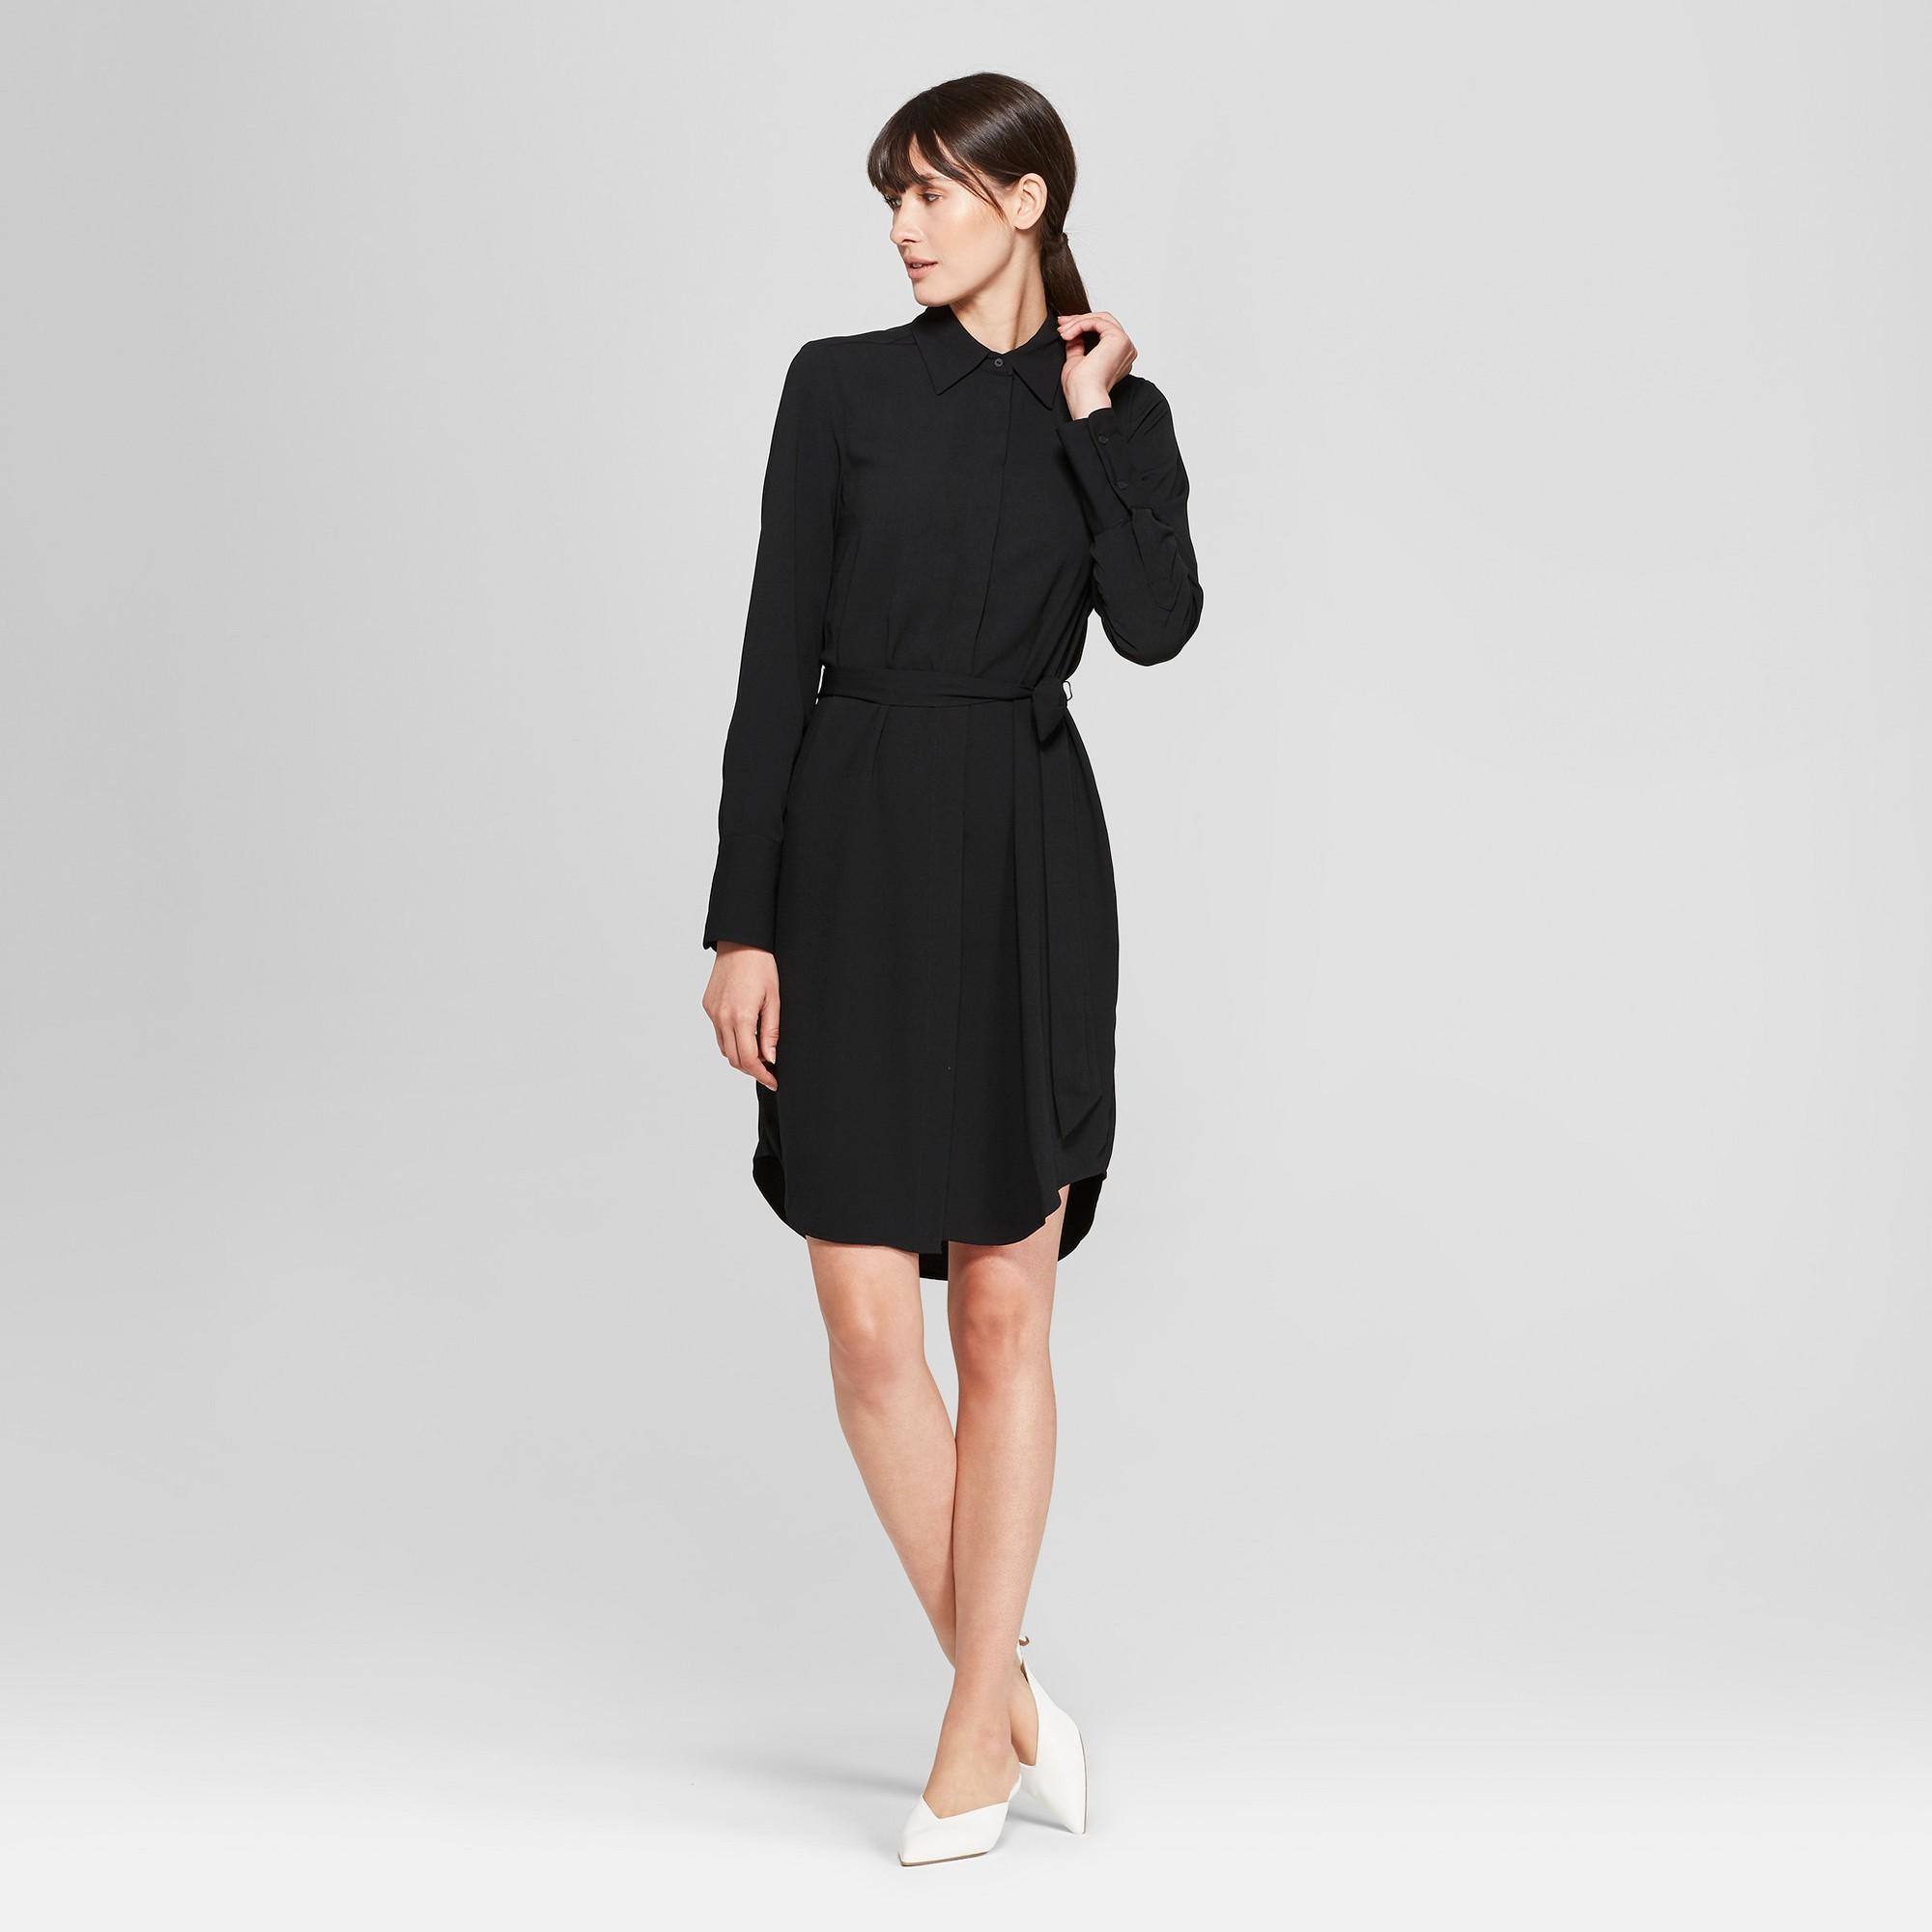 Women's Long Sleeve Collared Shirtdress - Prologue Black M